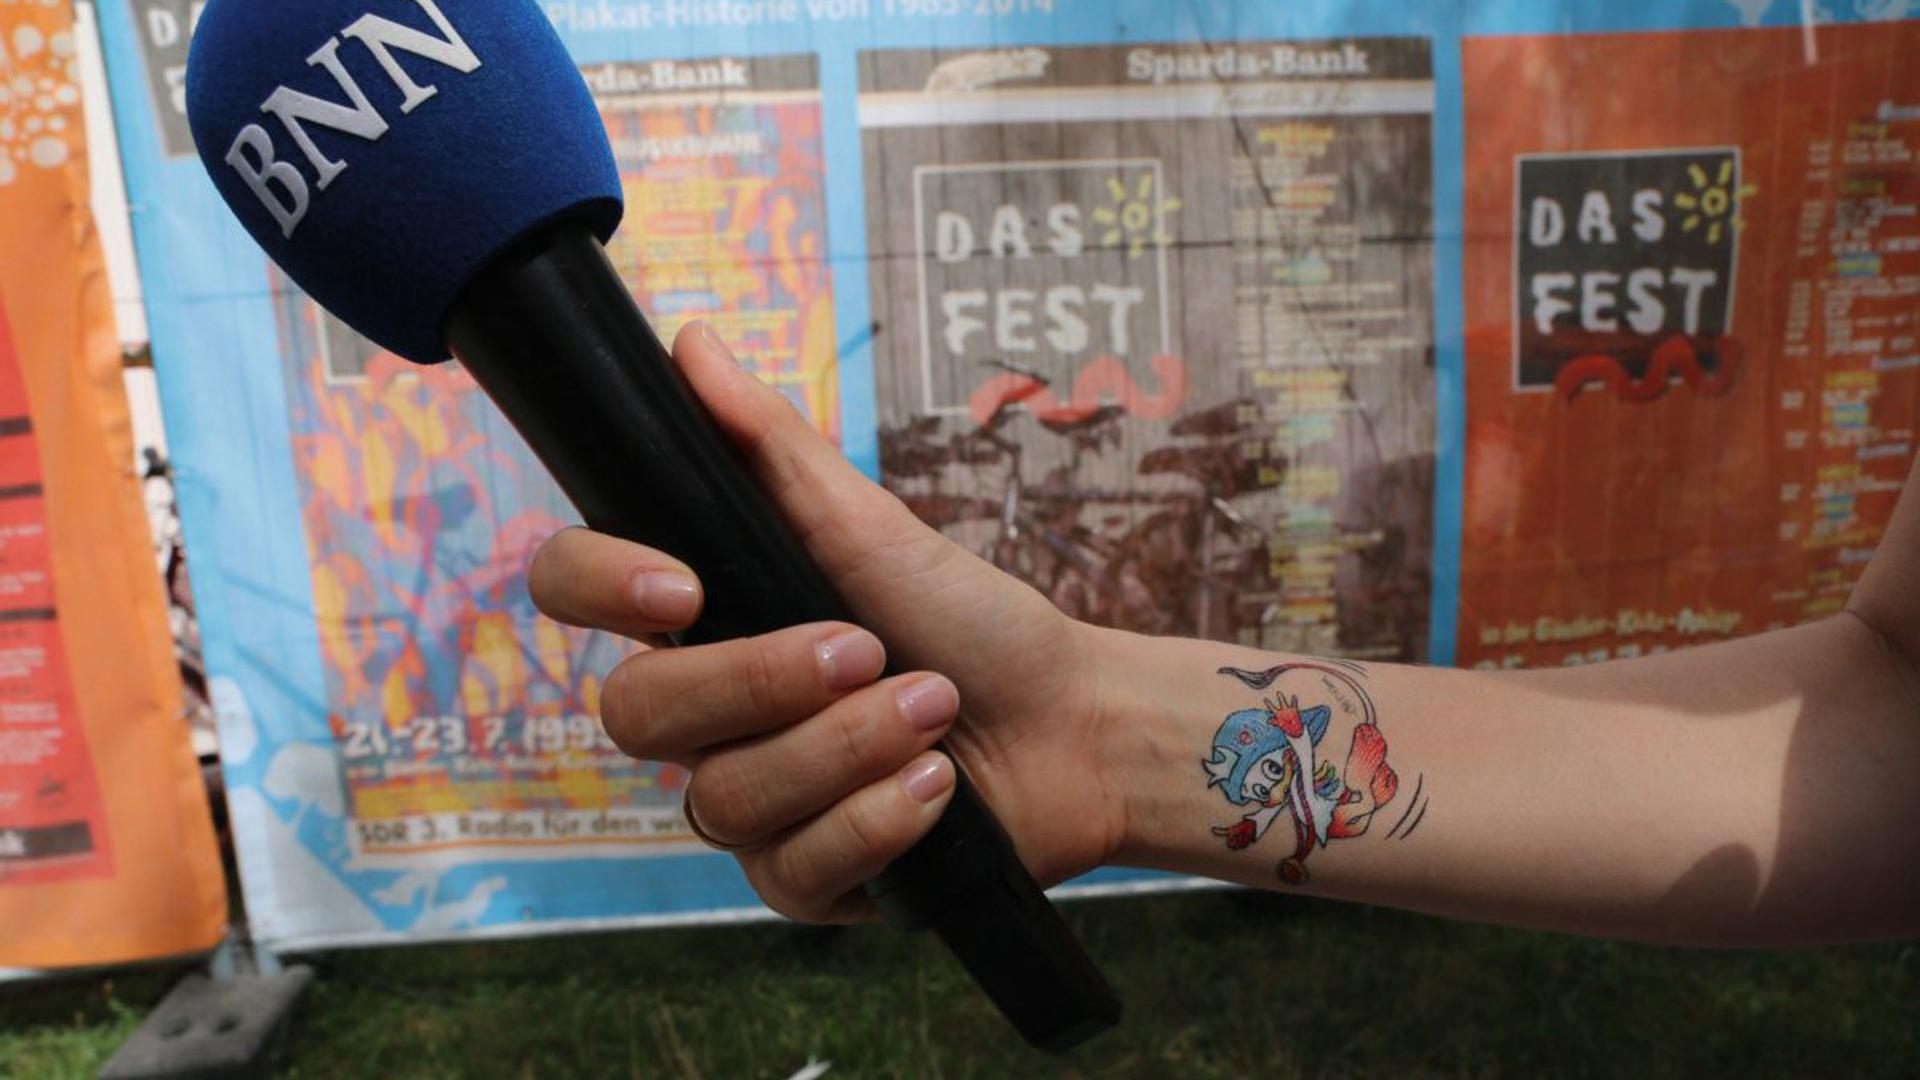 Umfrage Das Fest 2017